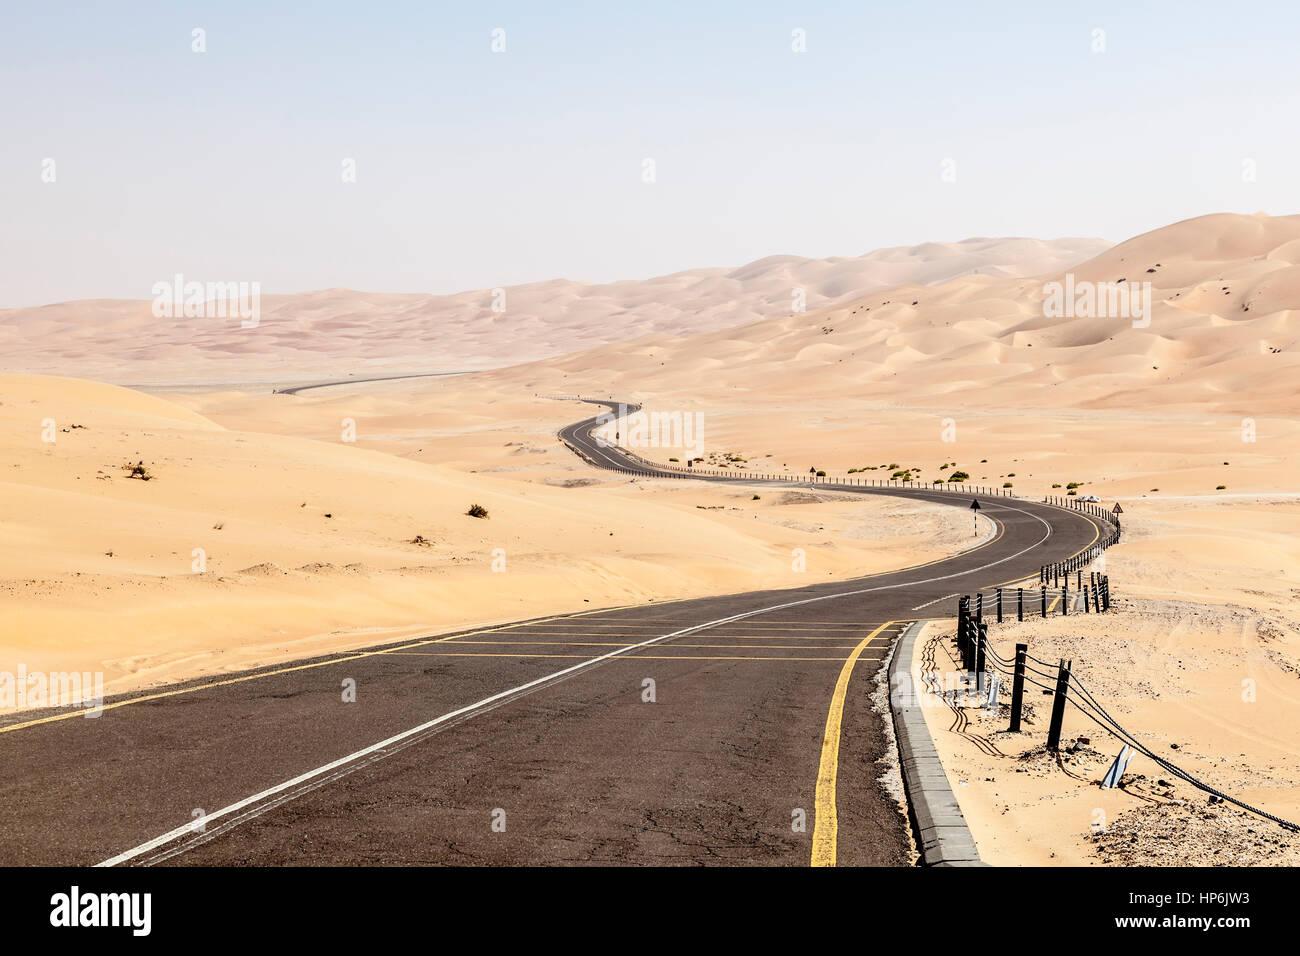 Desert road to the Moreeb Dune in Liwa Oasis area. Emirate of Abu Dhabi, United Arab Emirates - Stock Image